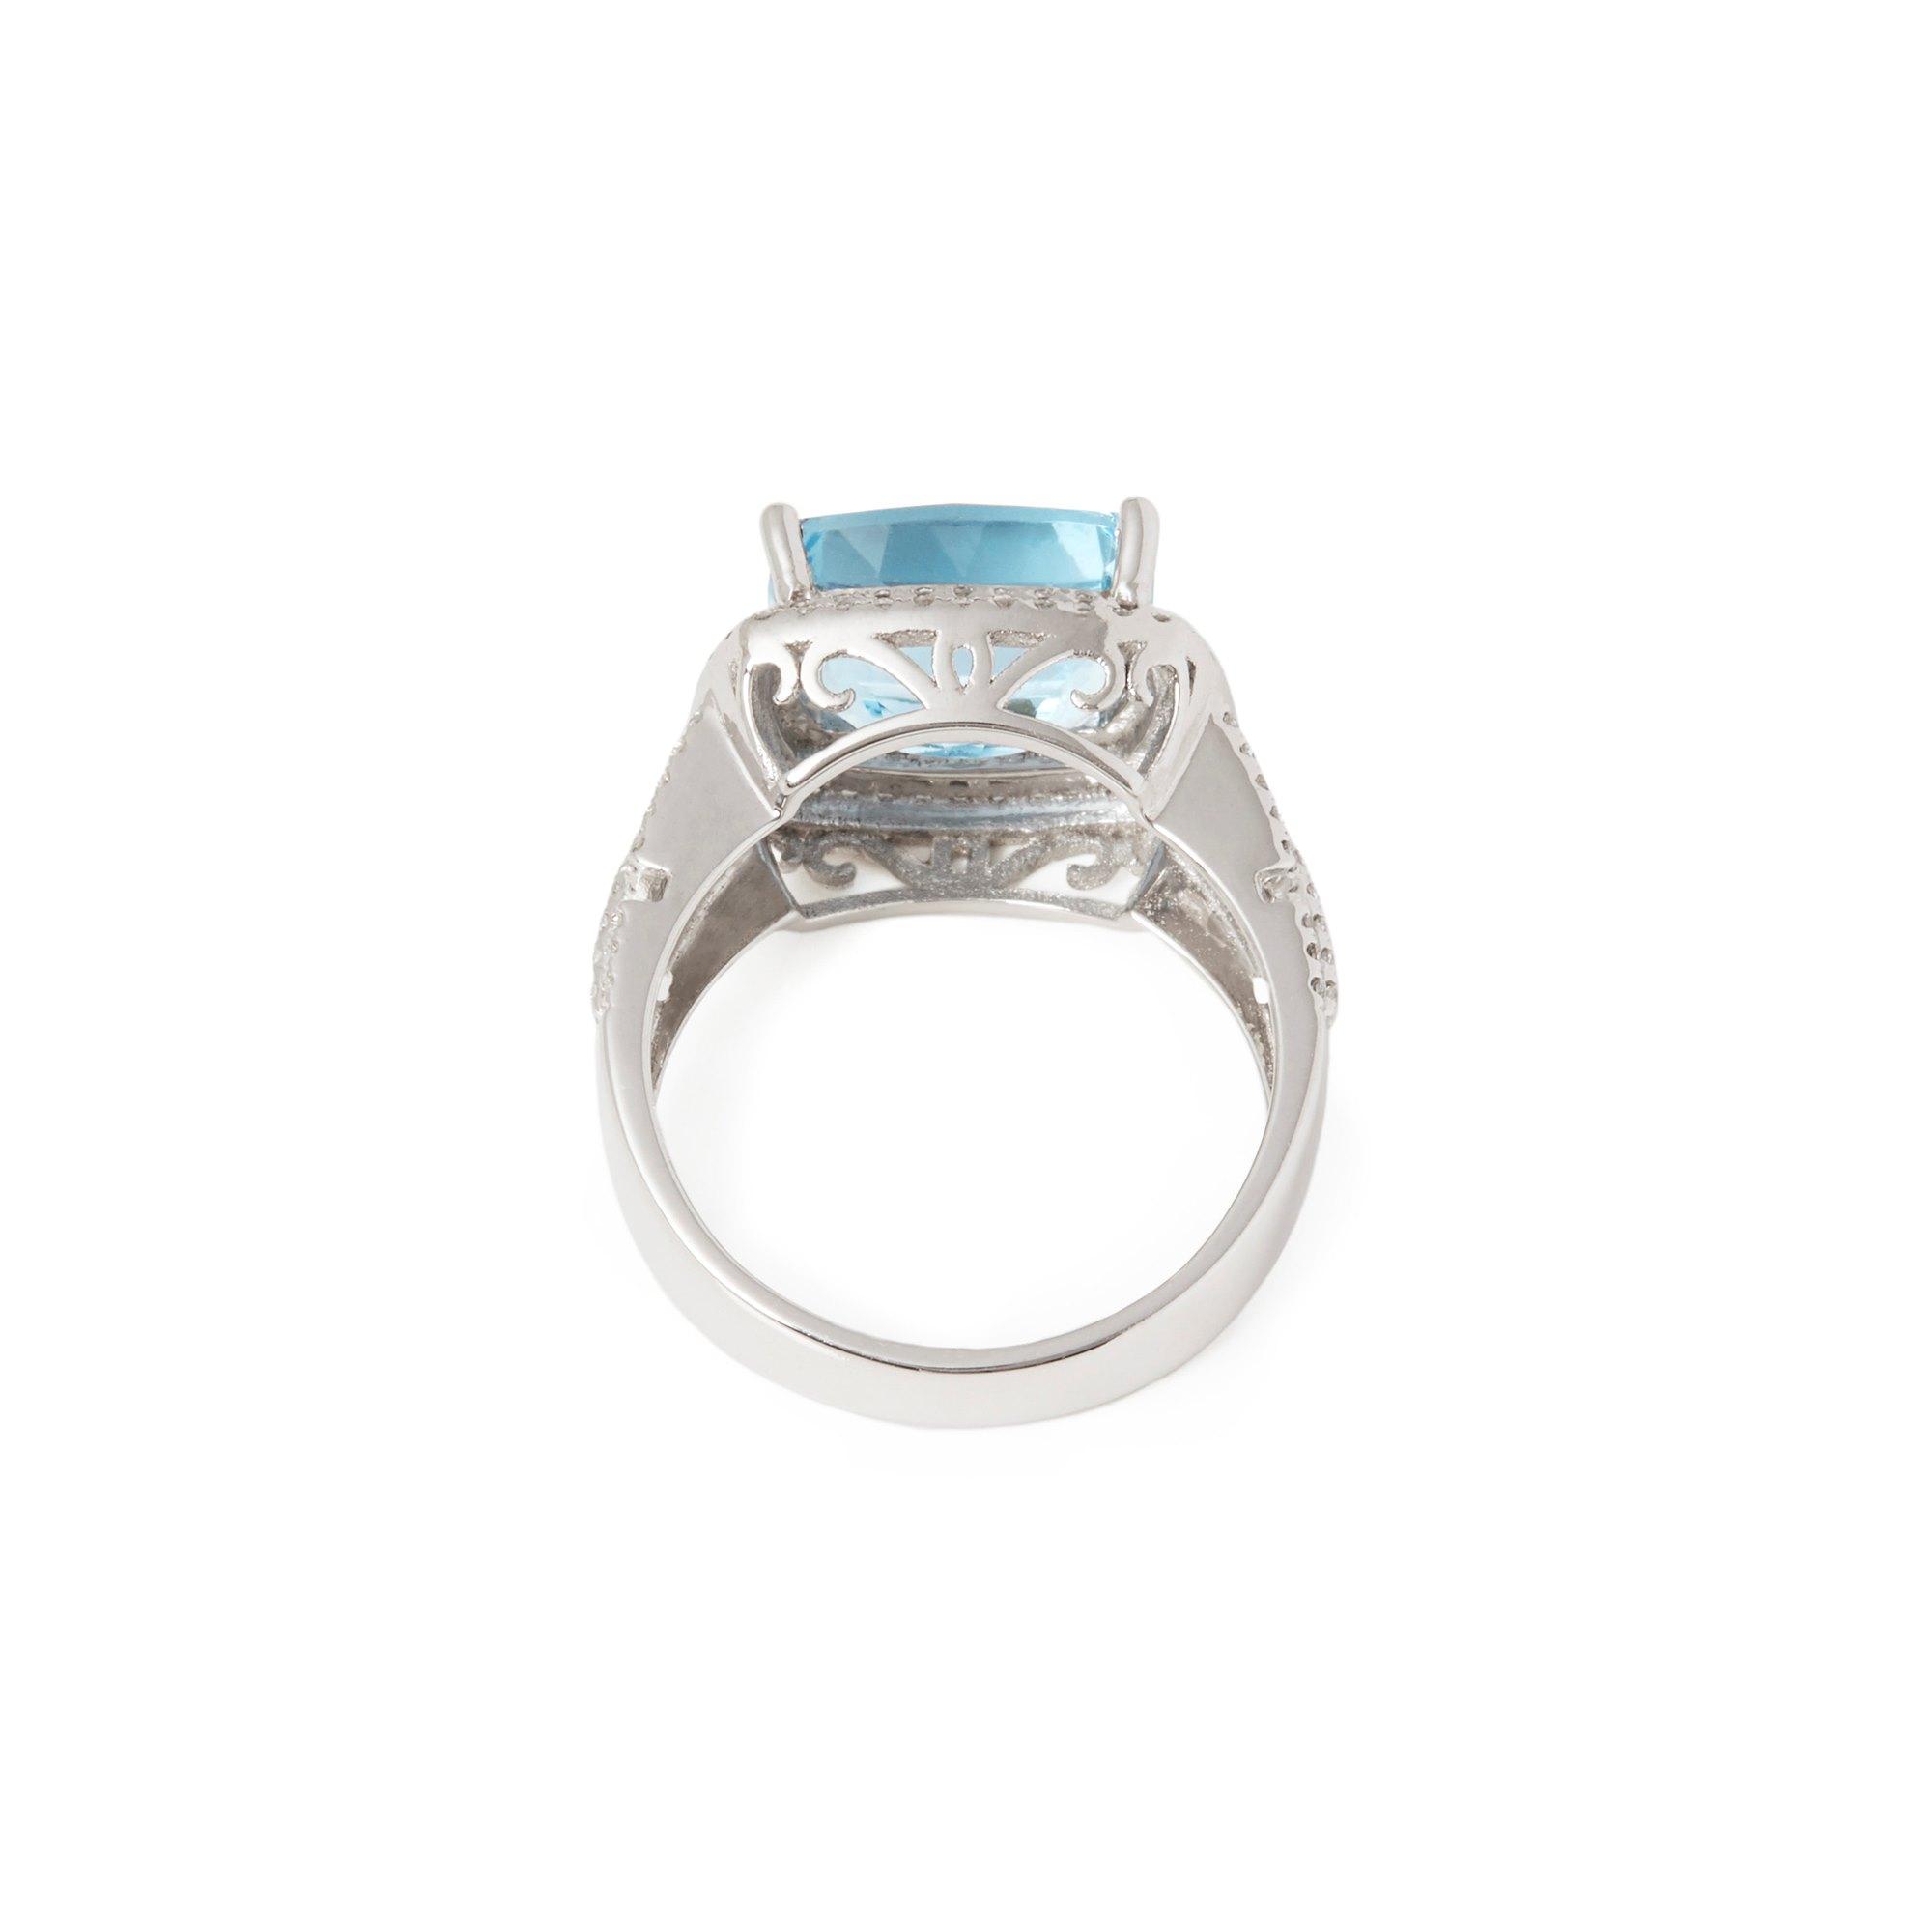 David Jerome Certified 4.81ct Brazilian Cushion cut Aquamarine and Diamond 18ct gold Ring